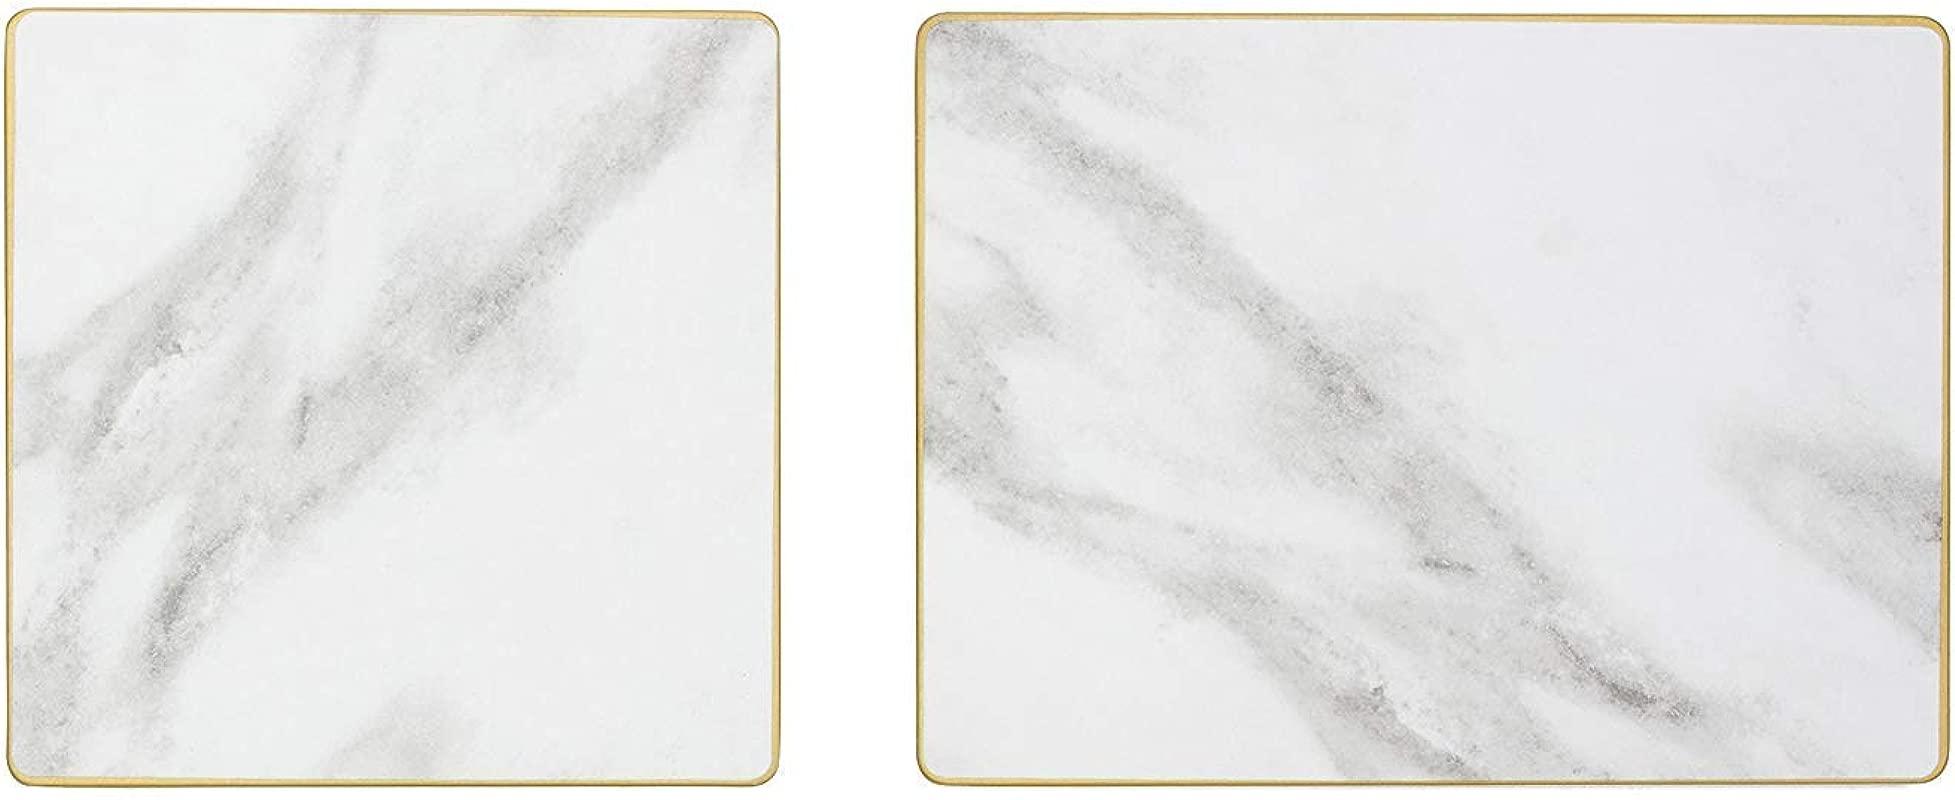 Sugar Cloth SC5CDGSMB02 Serving Set 2 Piece Marble Gold Trim